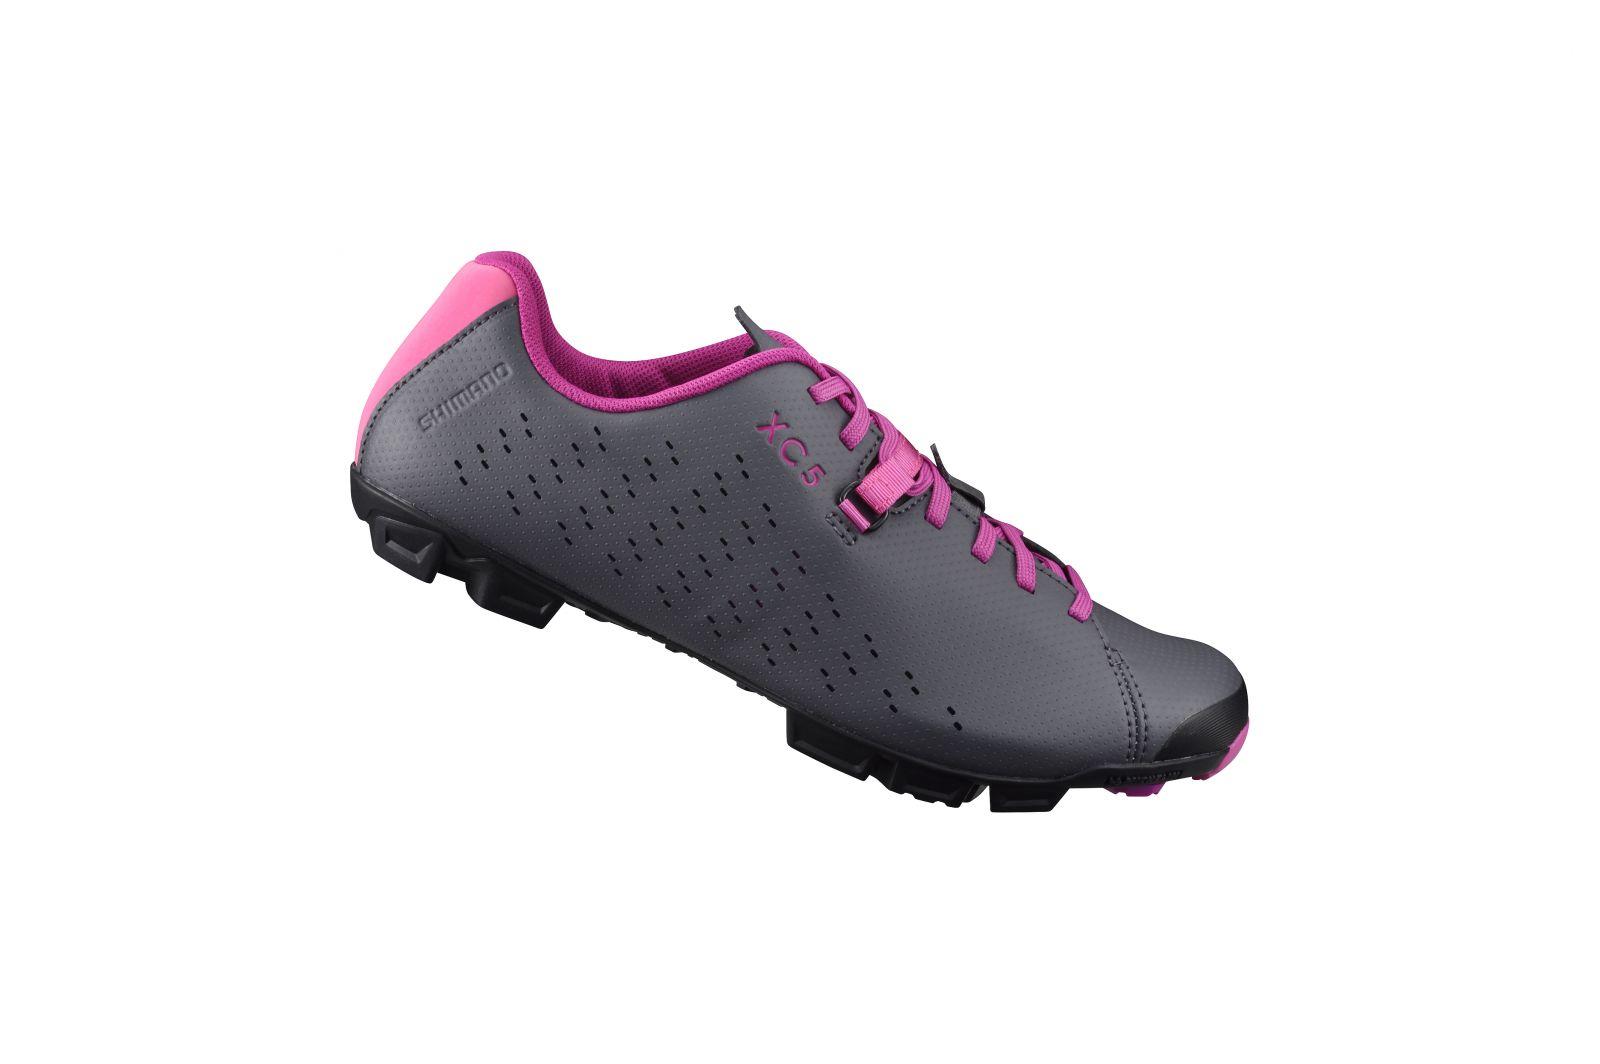 SHIMANO MTB obuv SH-XC500WG, šedá purpurová, 39